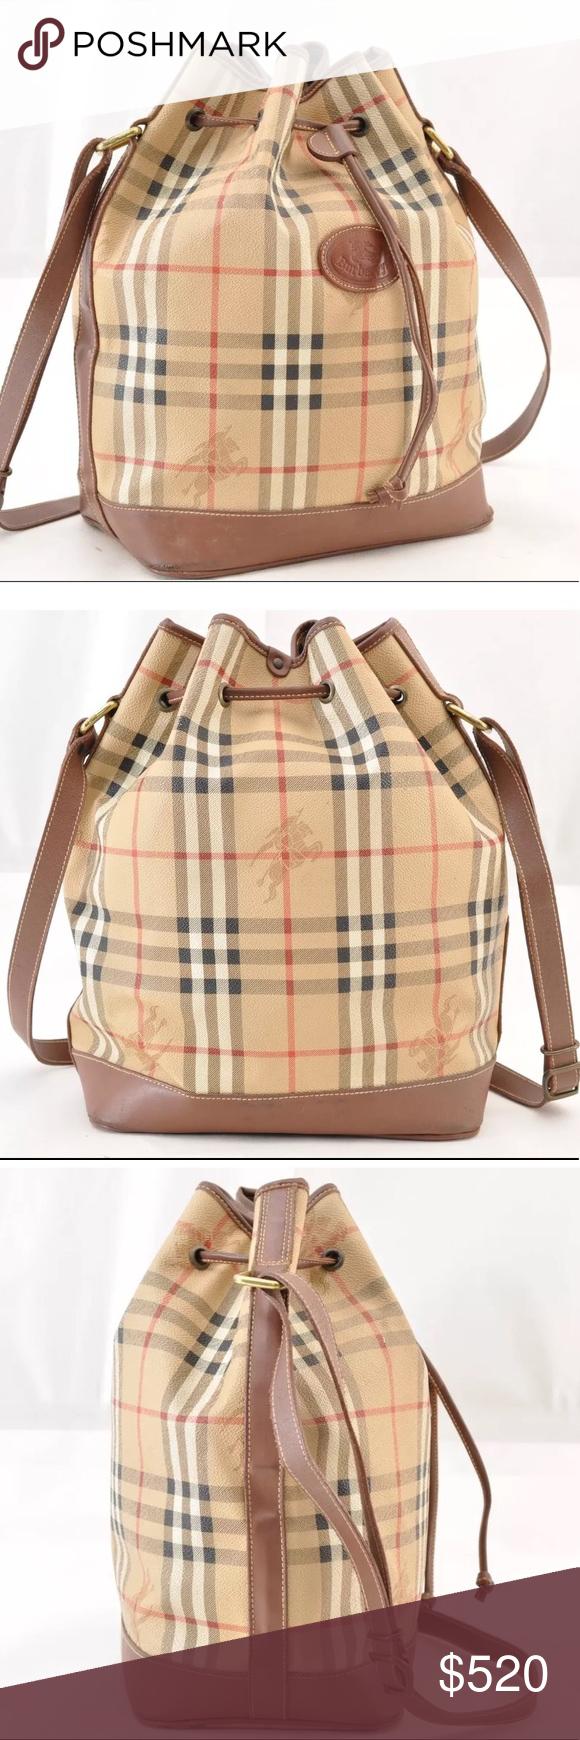 b7558c52e Authentic Burberry shoulder bag